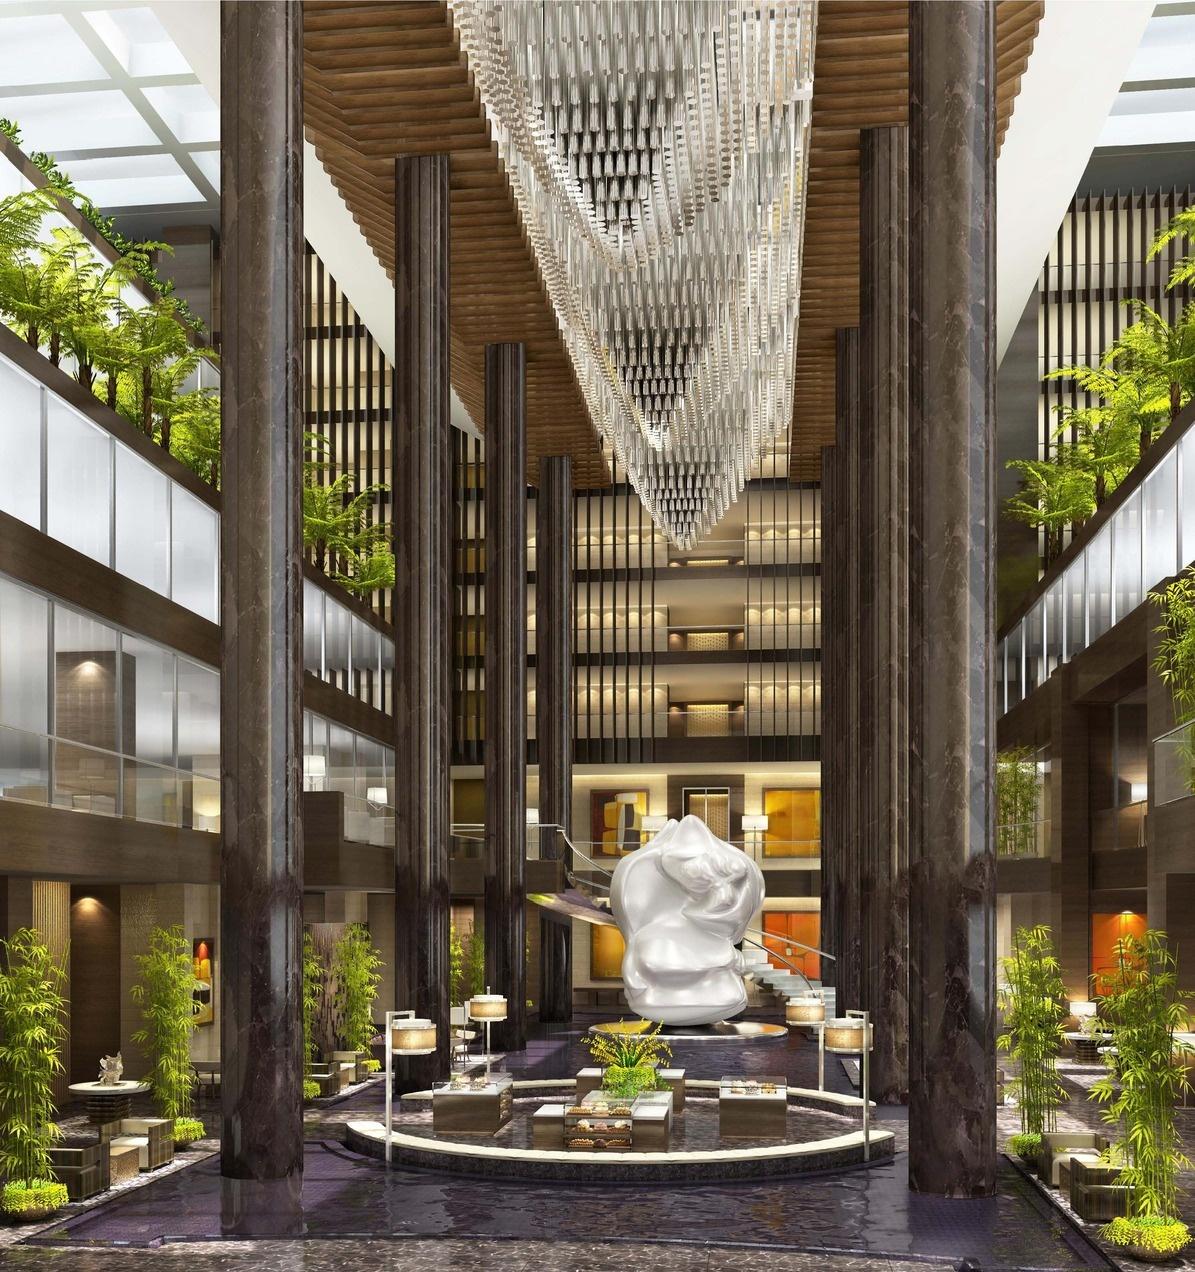 Luxury Park luxury park hyatt hotel opens in hyderabad expanding hyatt portfolio